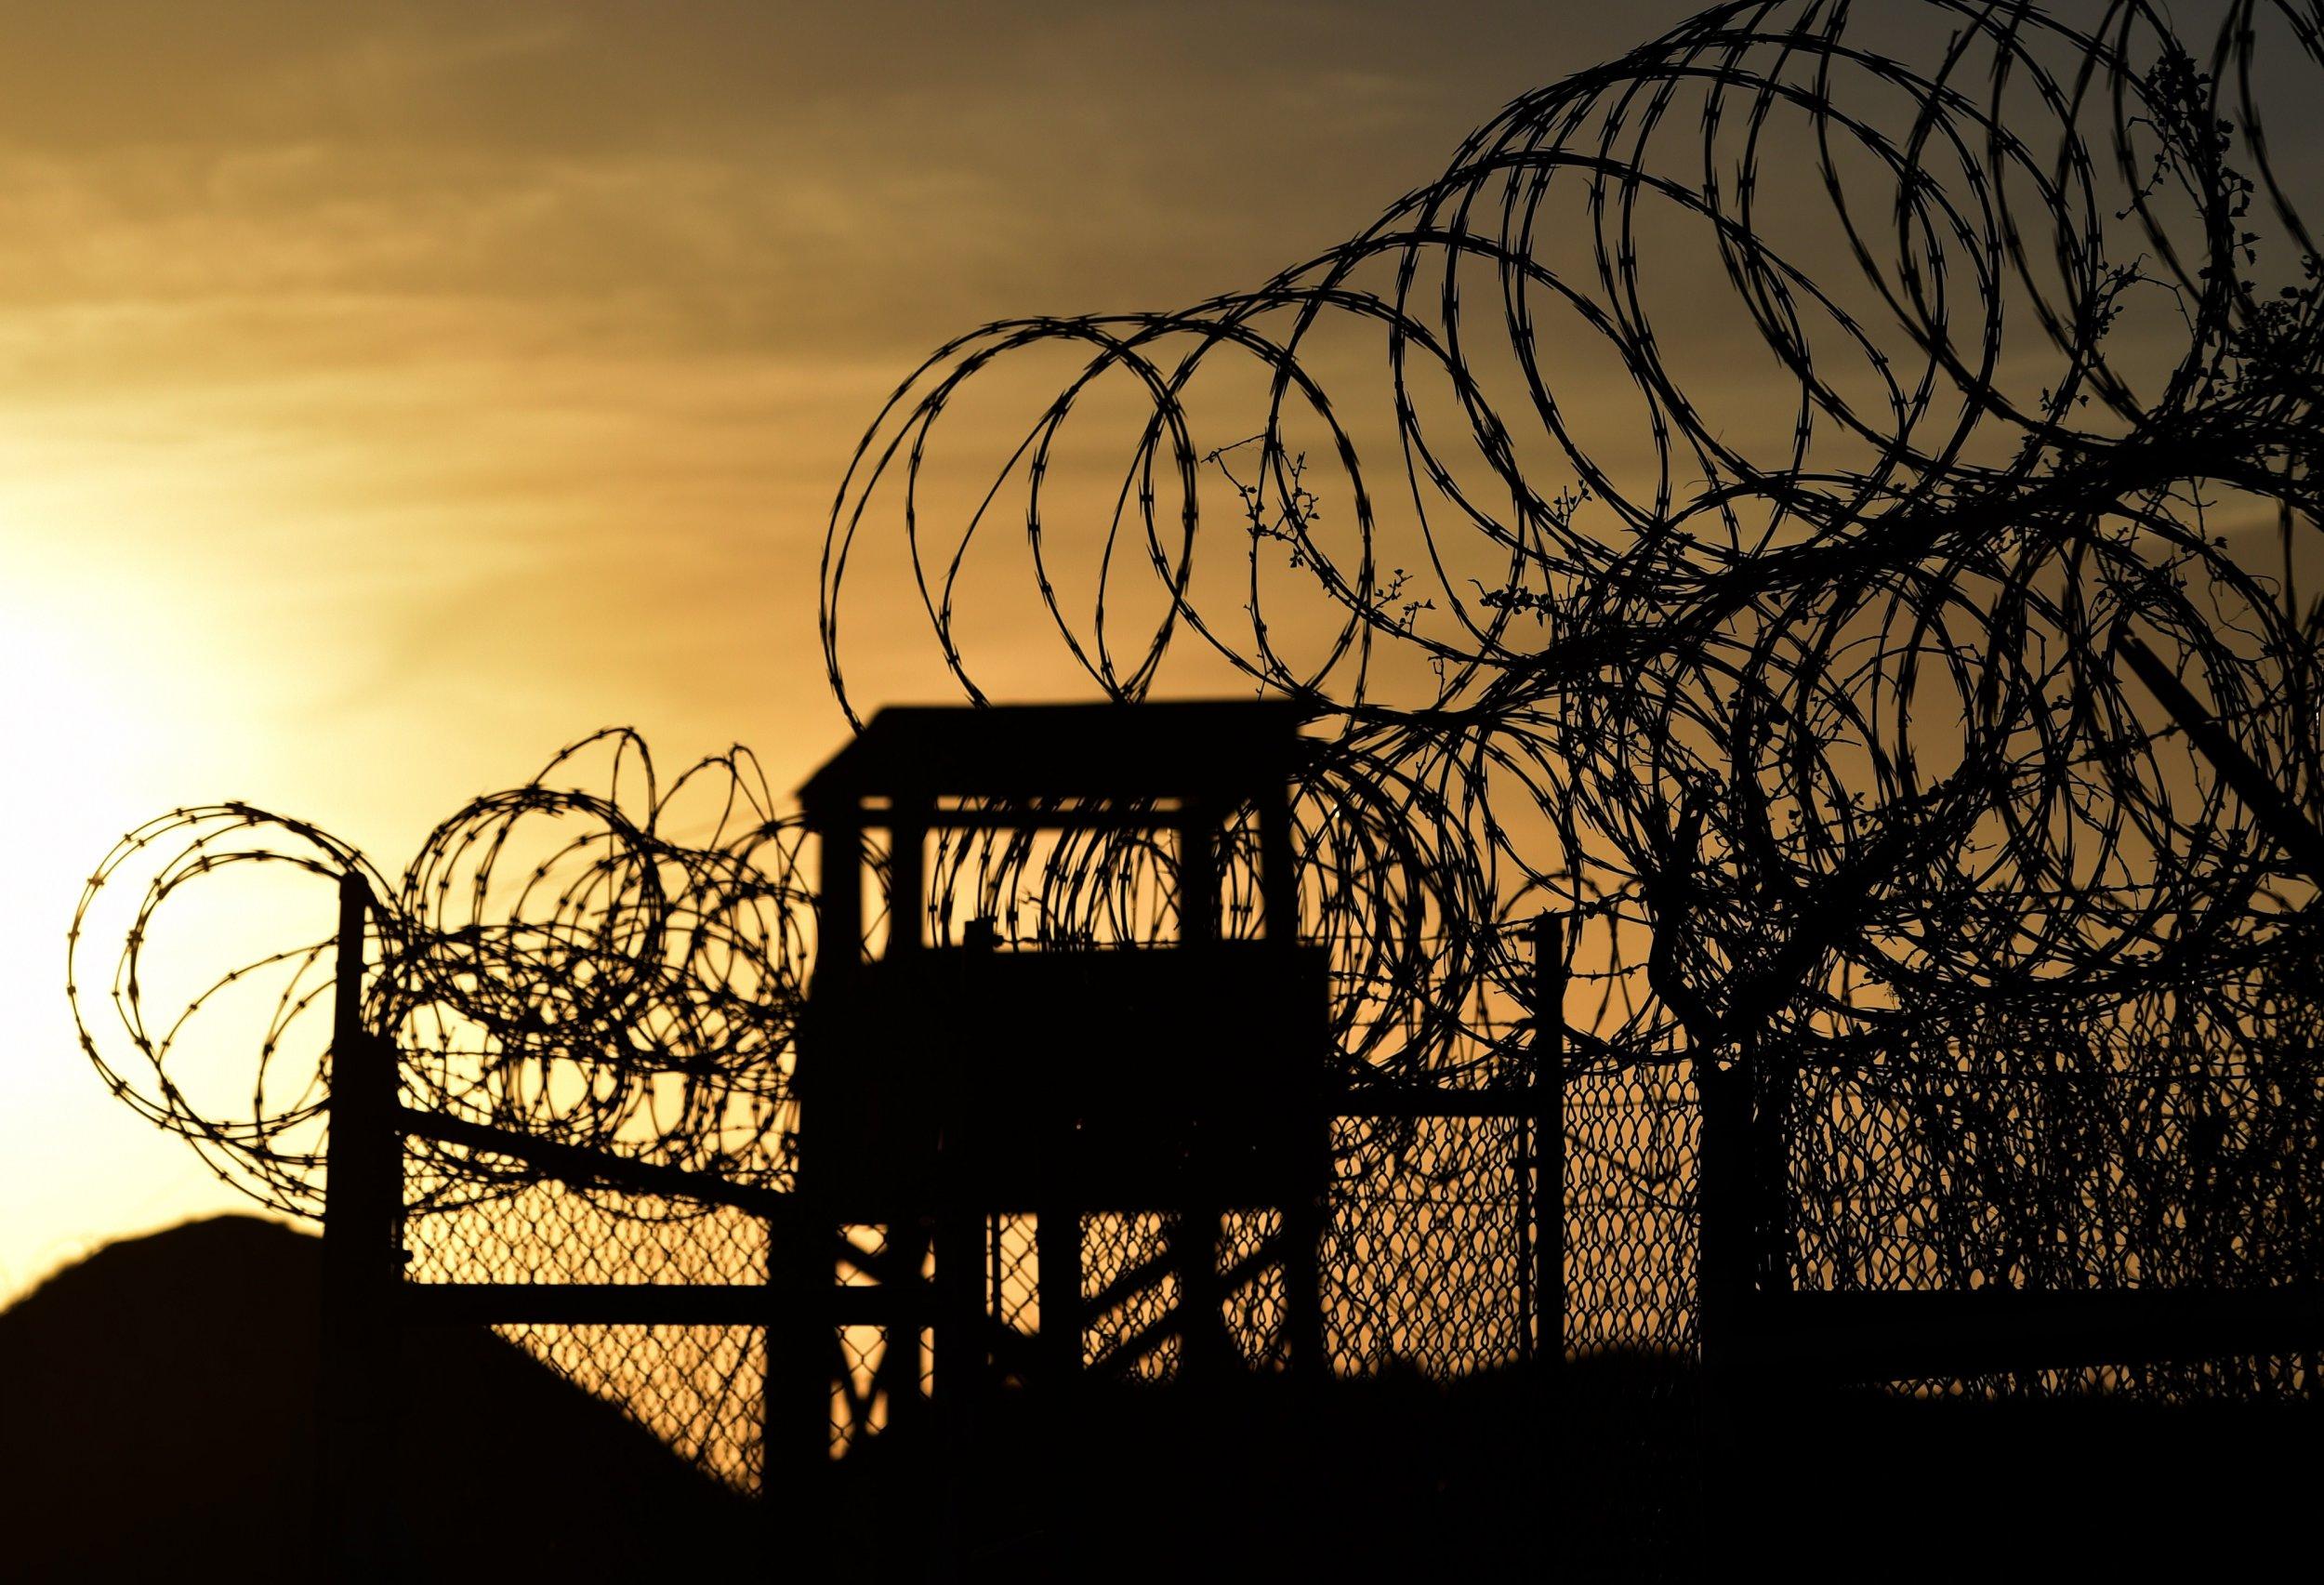 Interrogation // Guantanamo Bay Detention Center